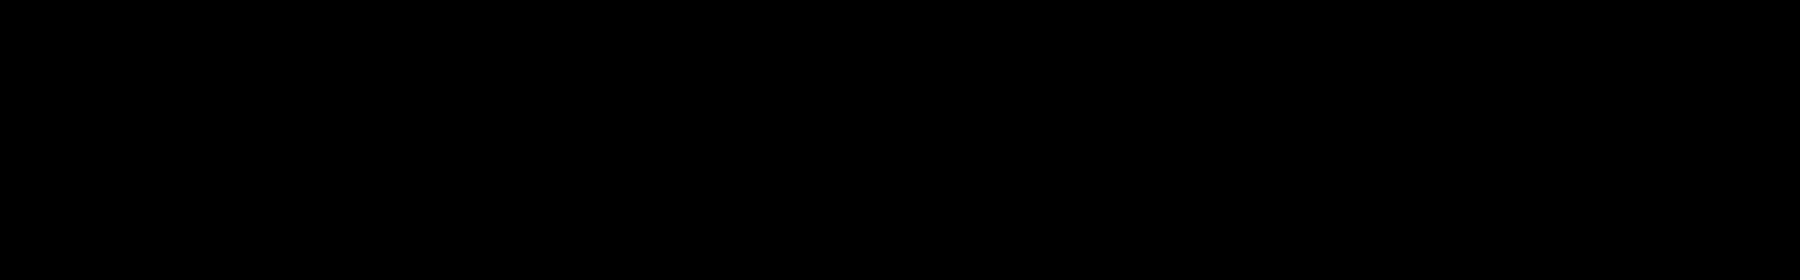 Contemporary Electronica audio waveform